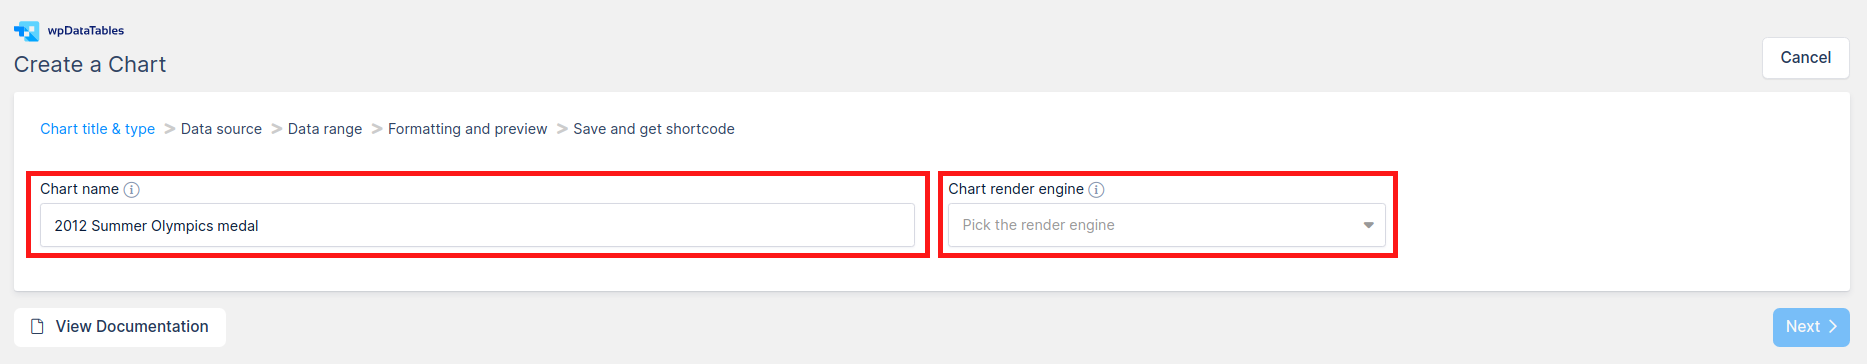 Chart name and engine